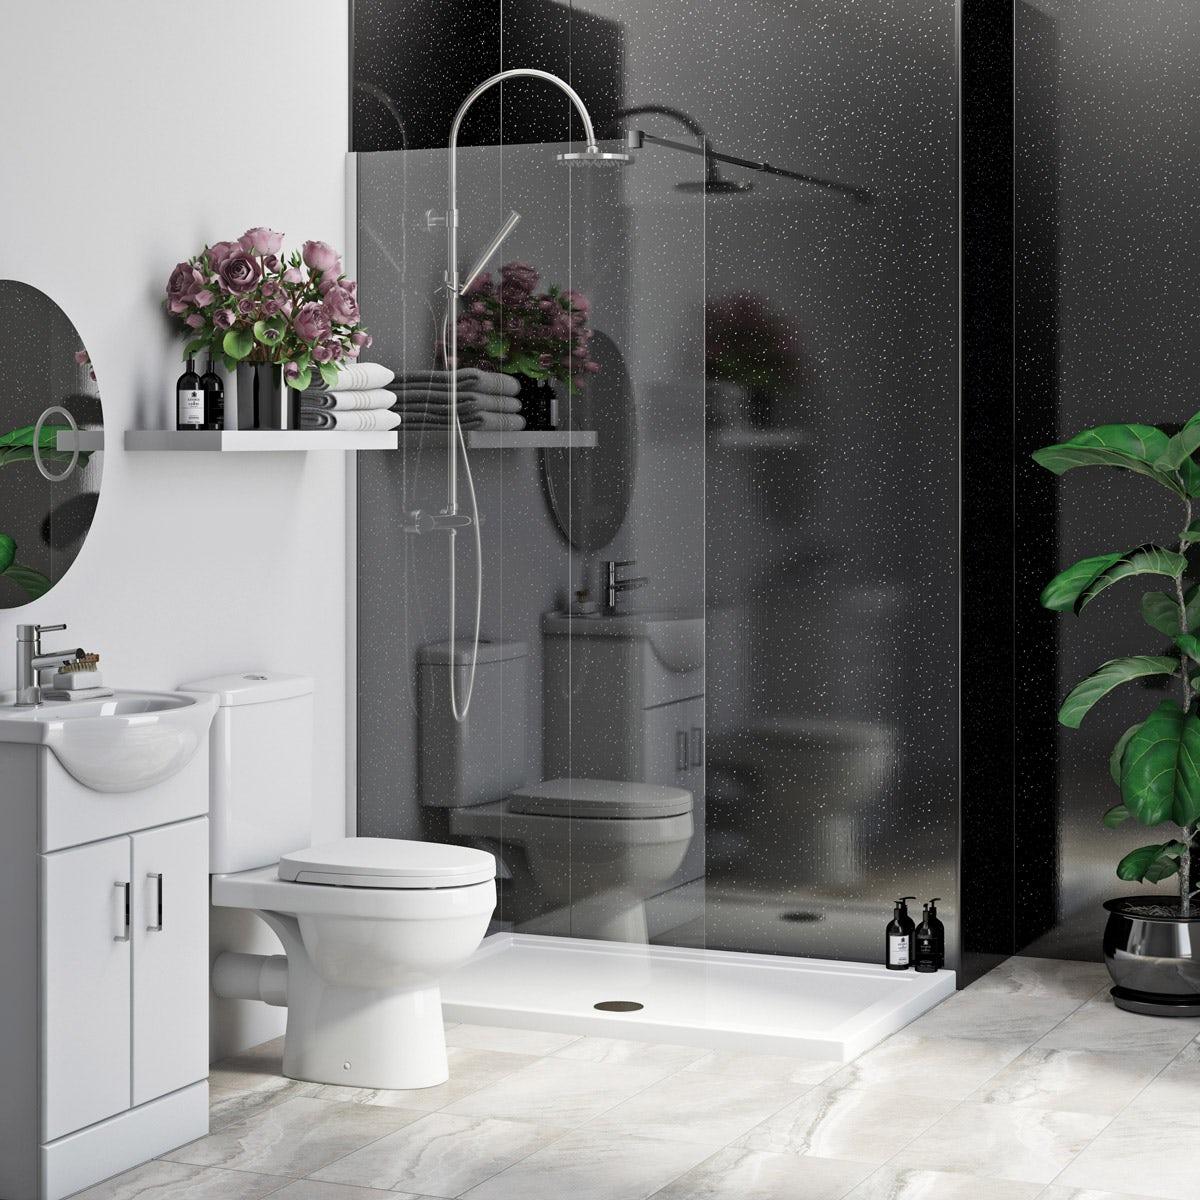 Multipanel Economy Moonlit Quartz shower wall 2 panel pack